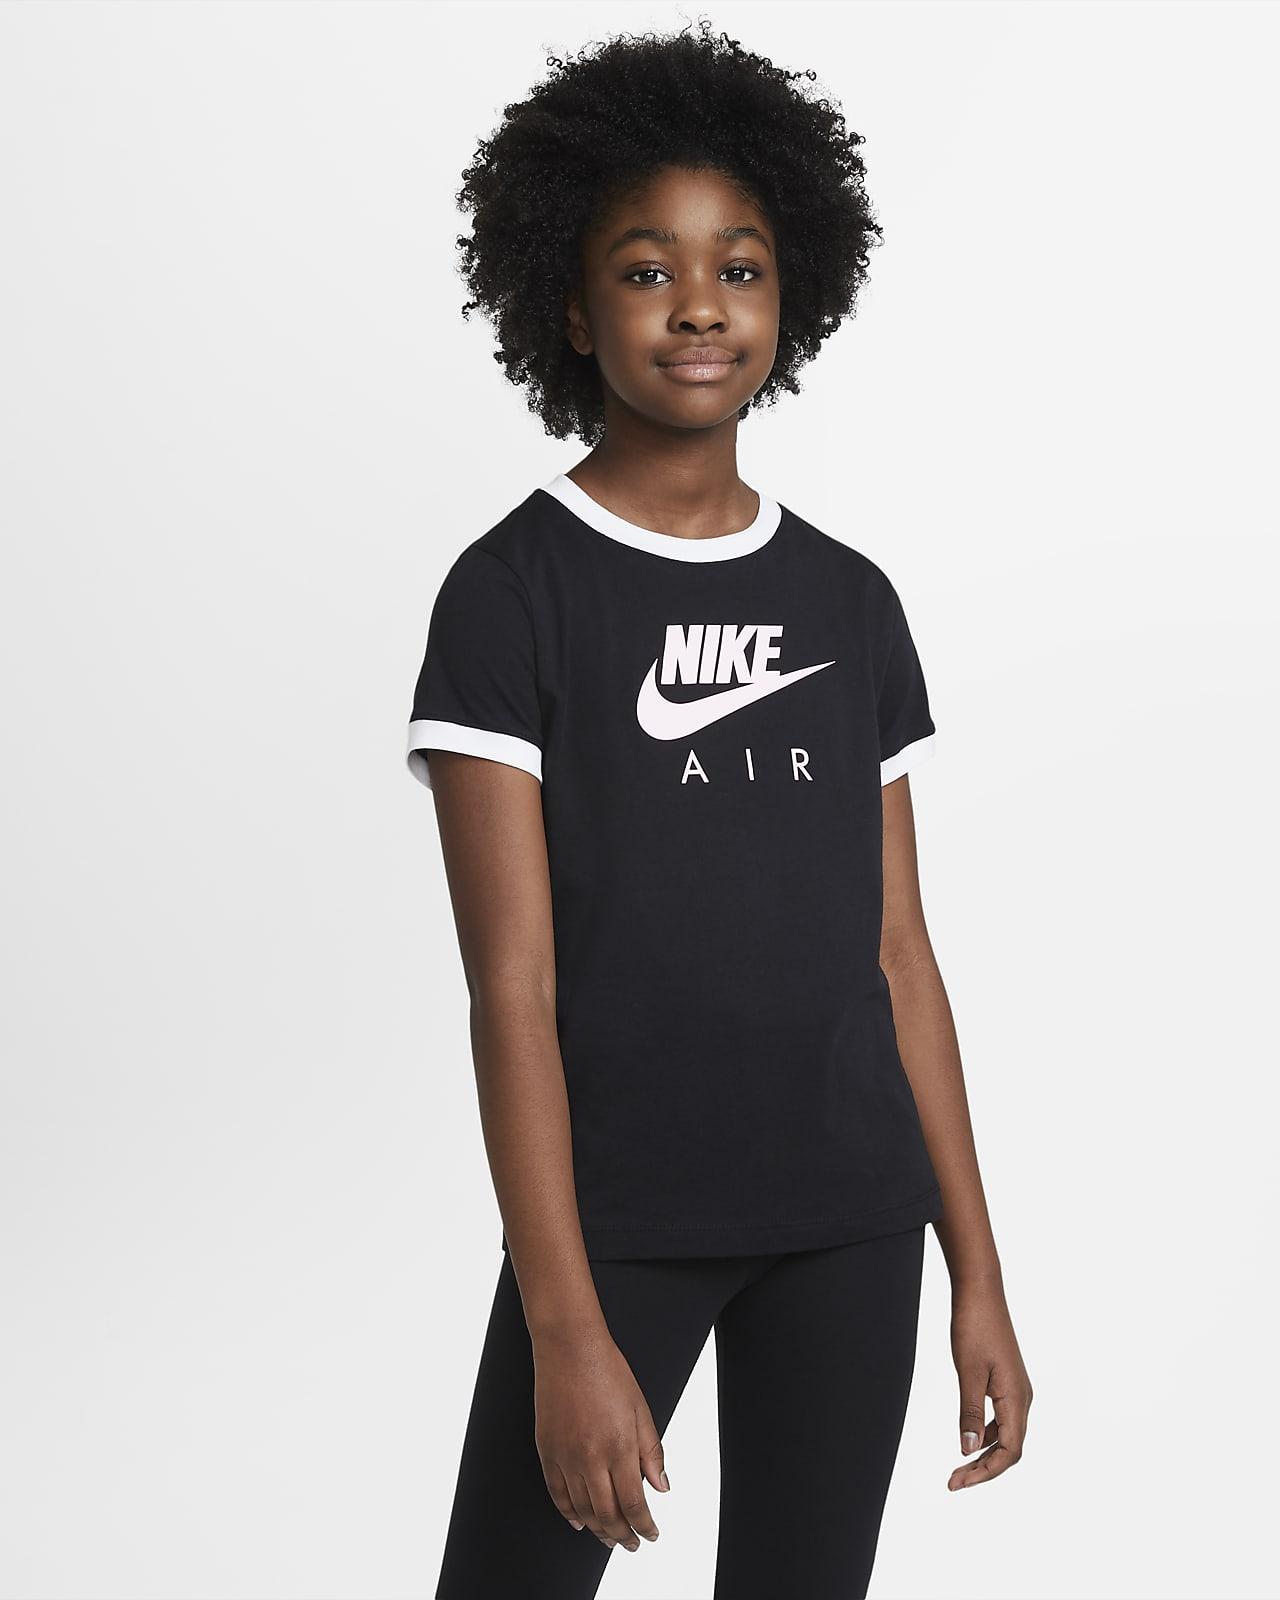 Nike Air Camiseta - Niña